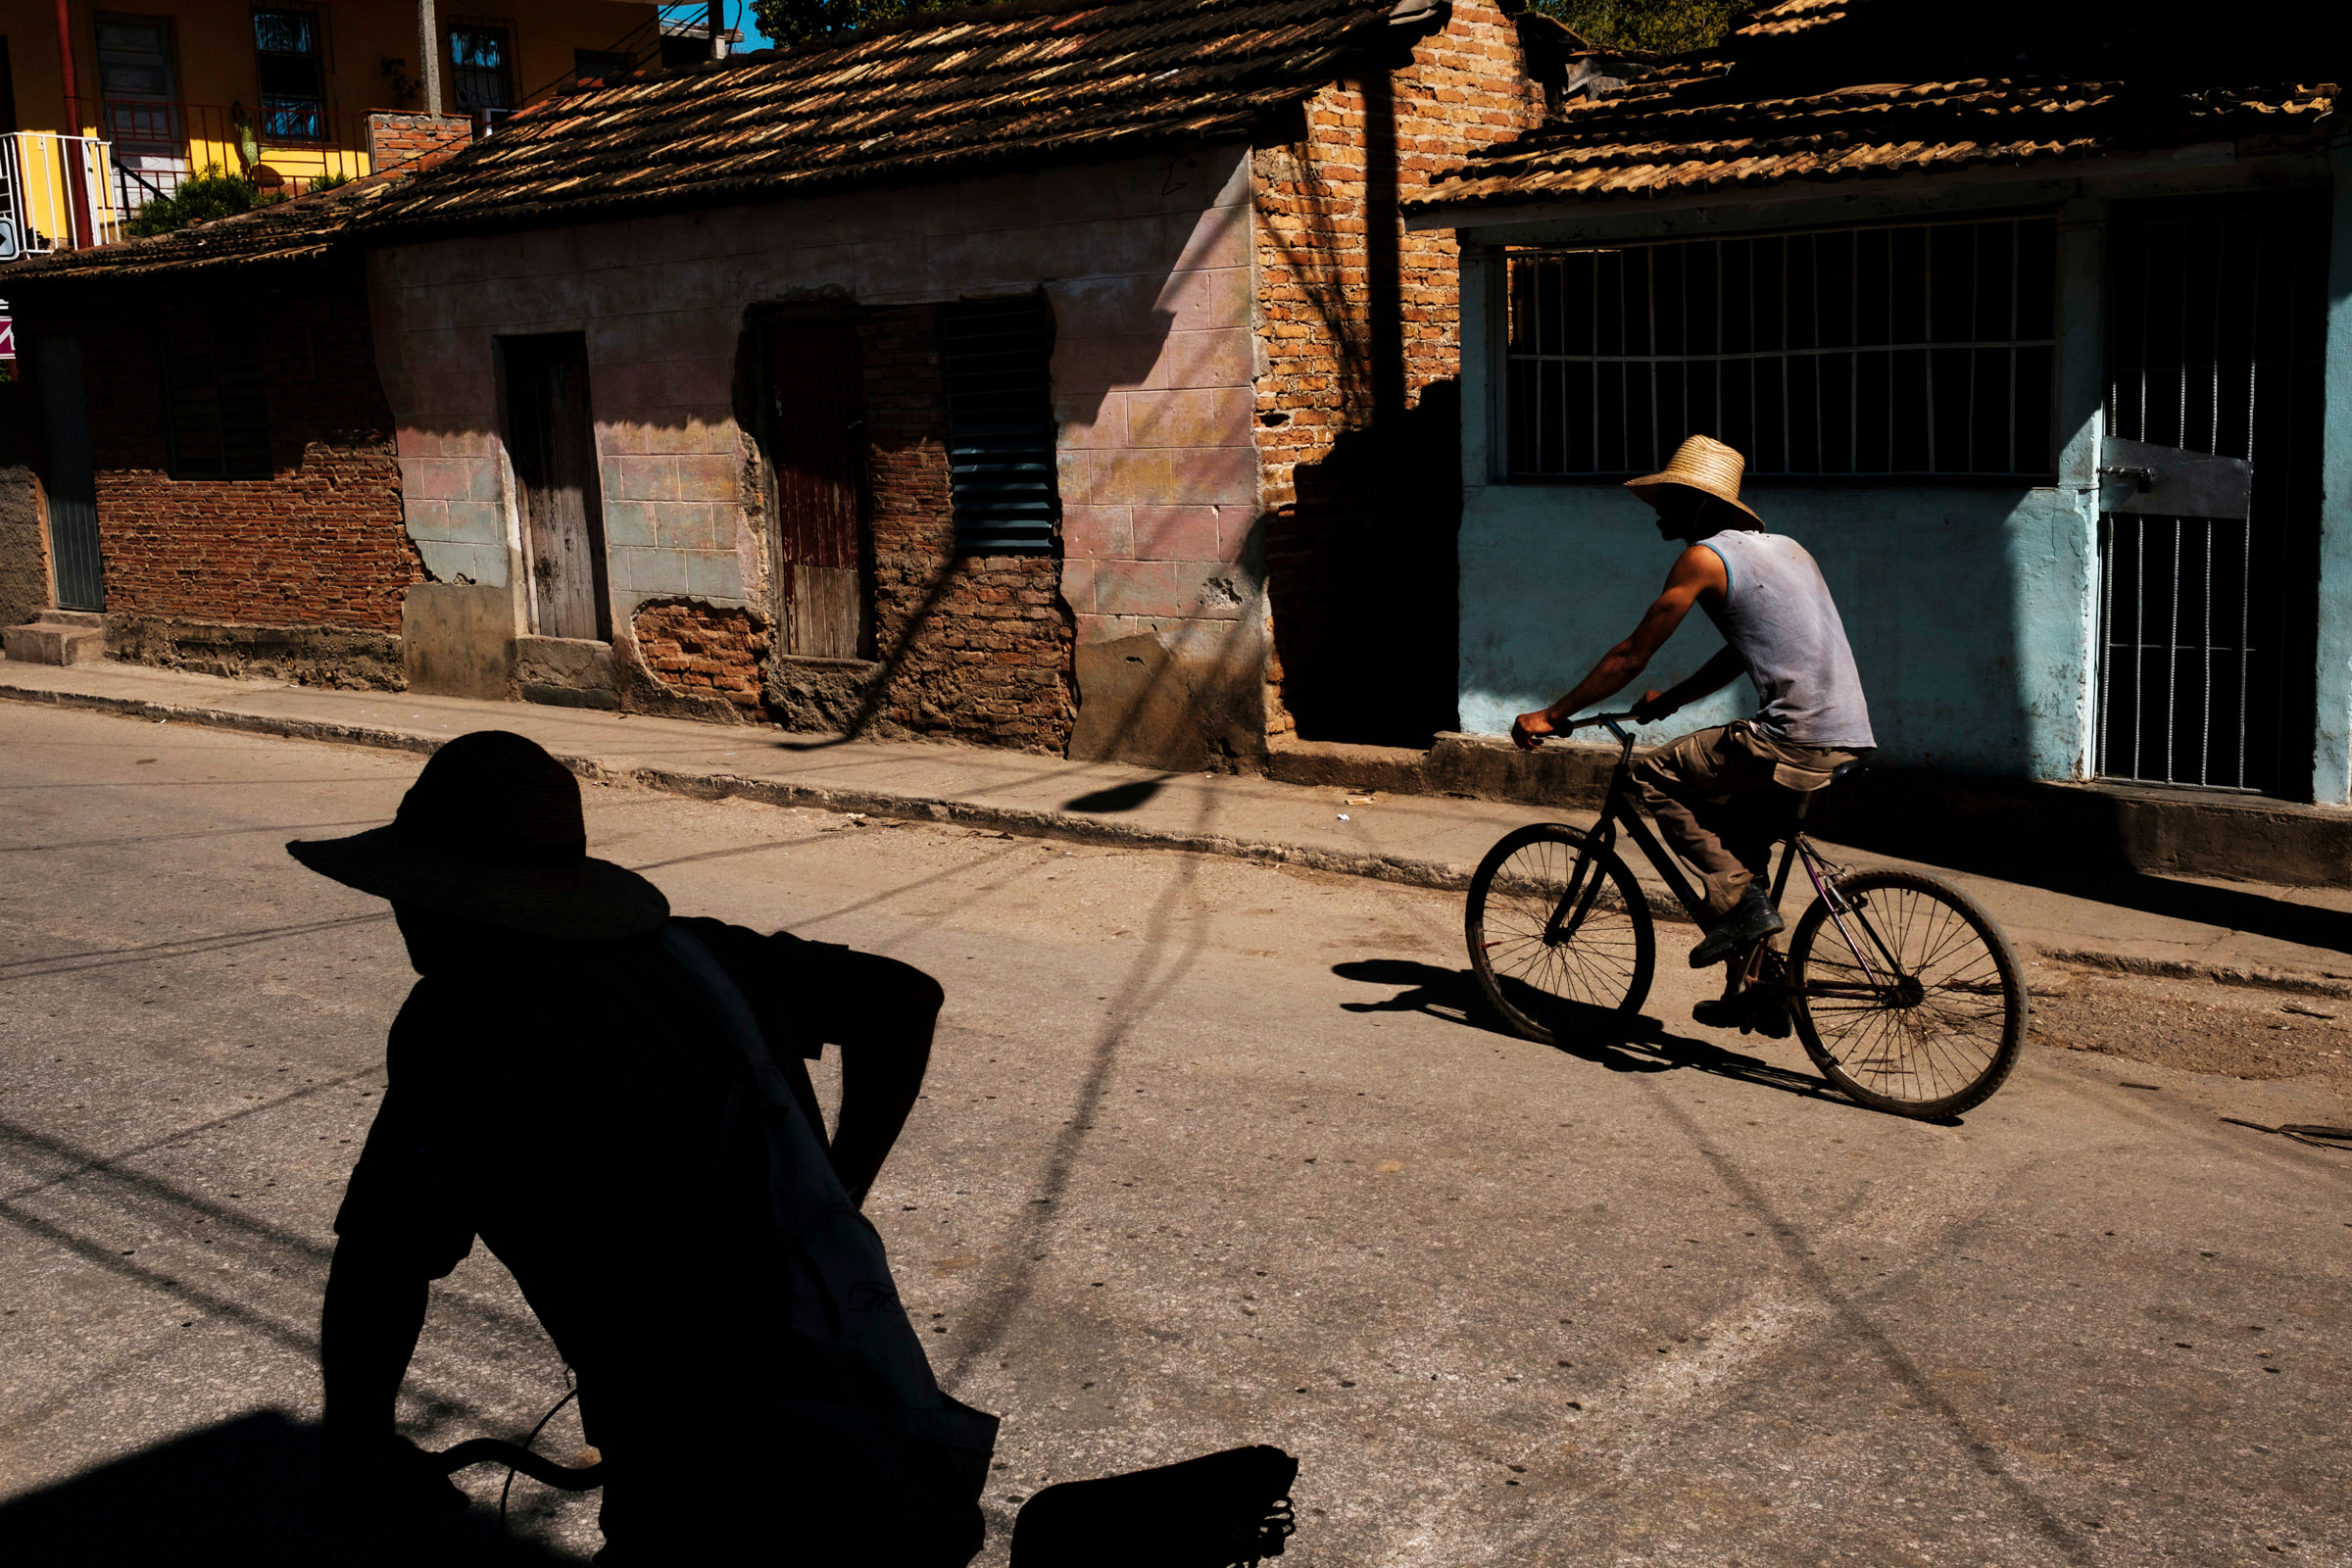 Cuba-Street-Photography-17